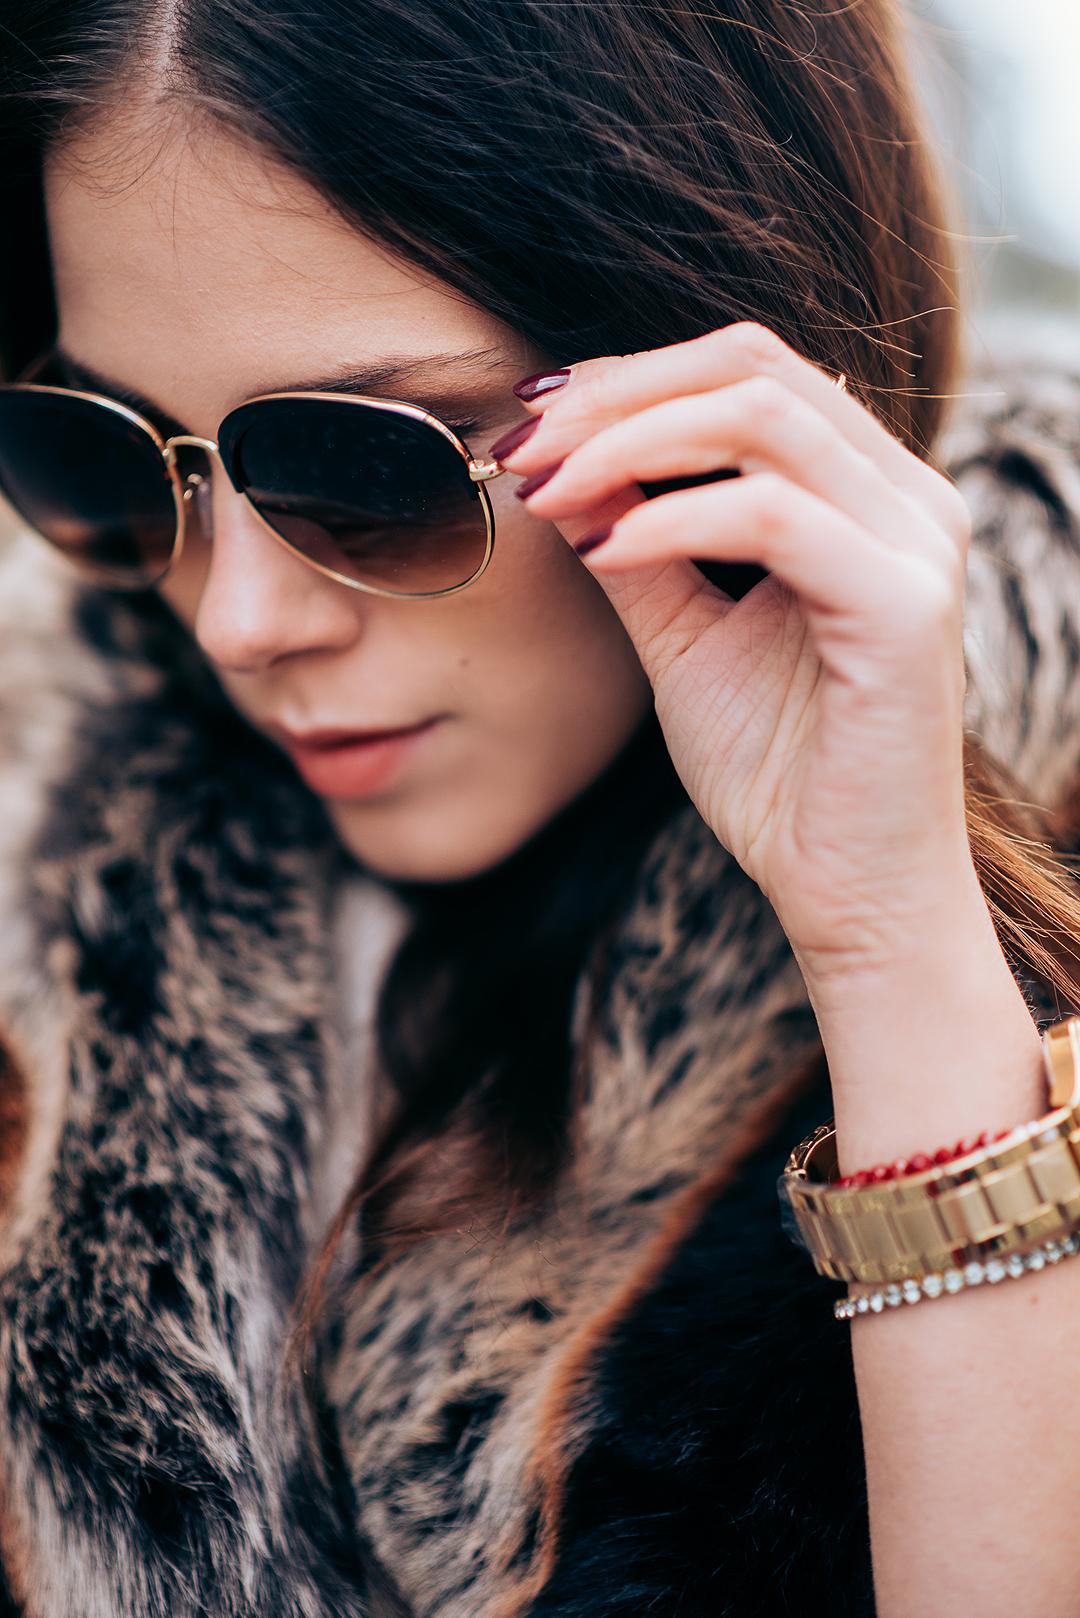 eva-ahacevcic_love-eva_sportina_parfois_ootd_accessories-4